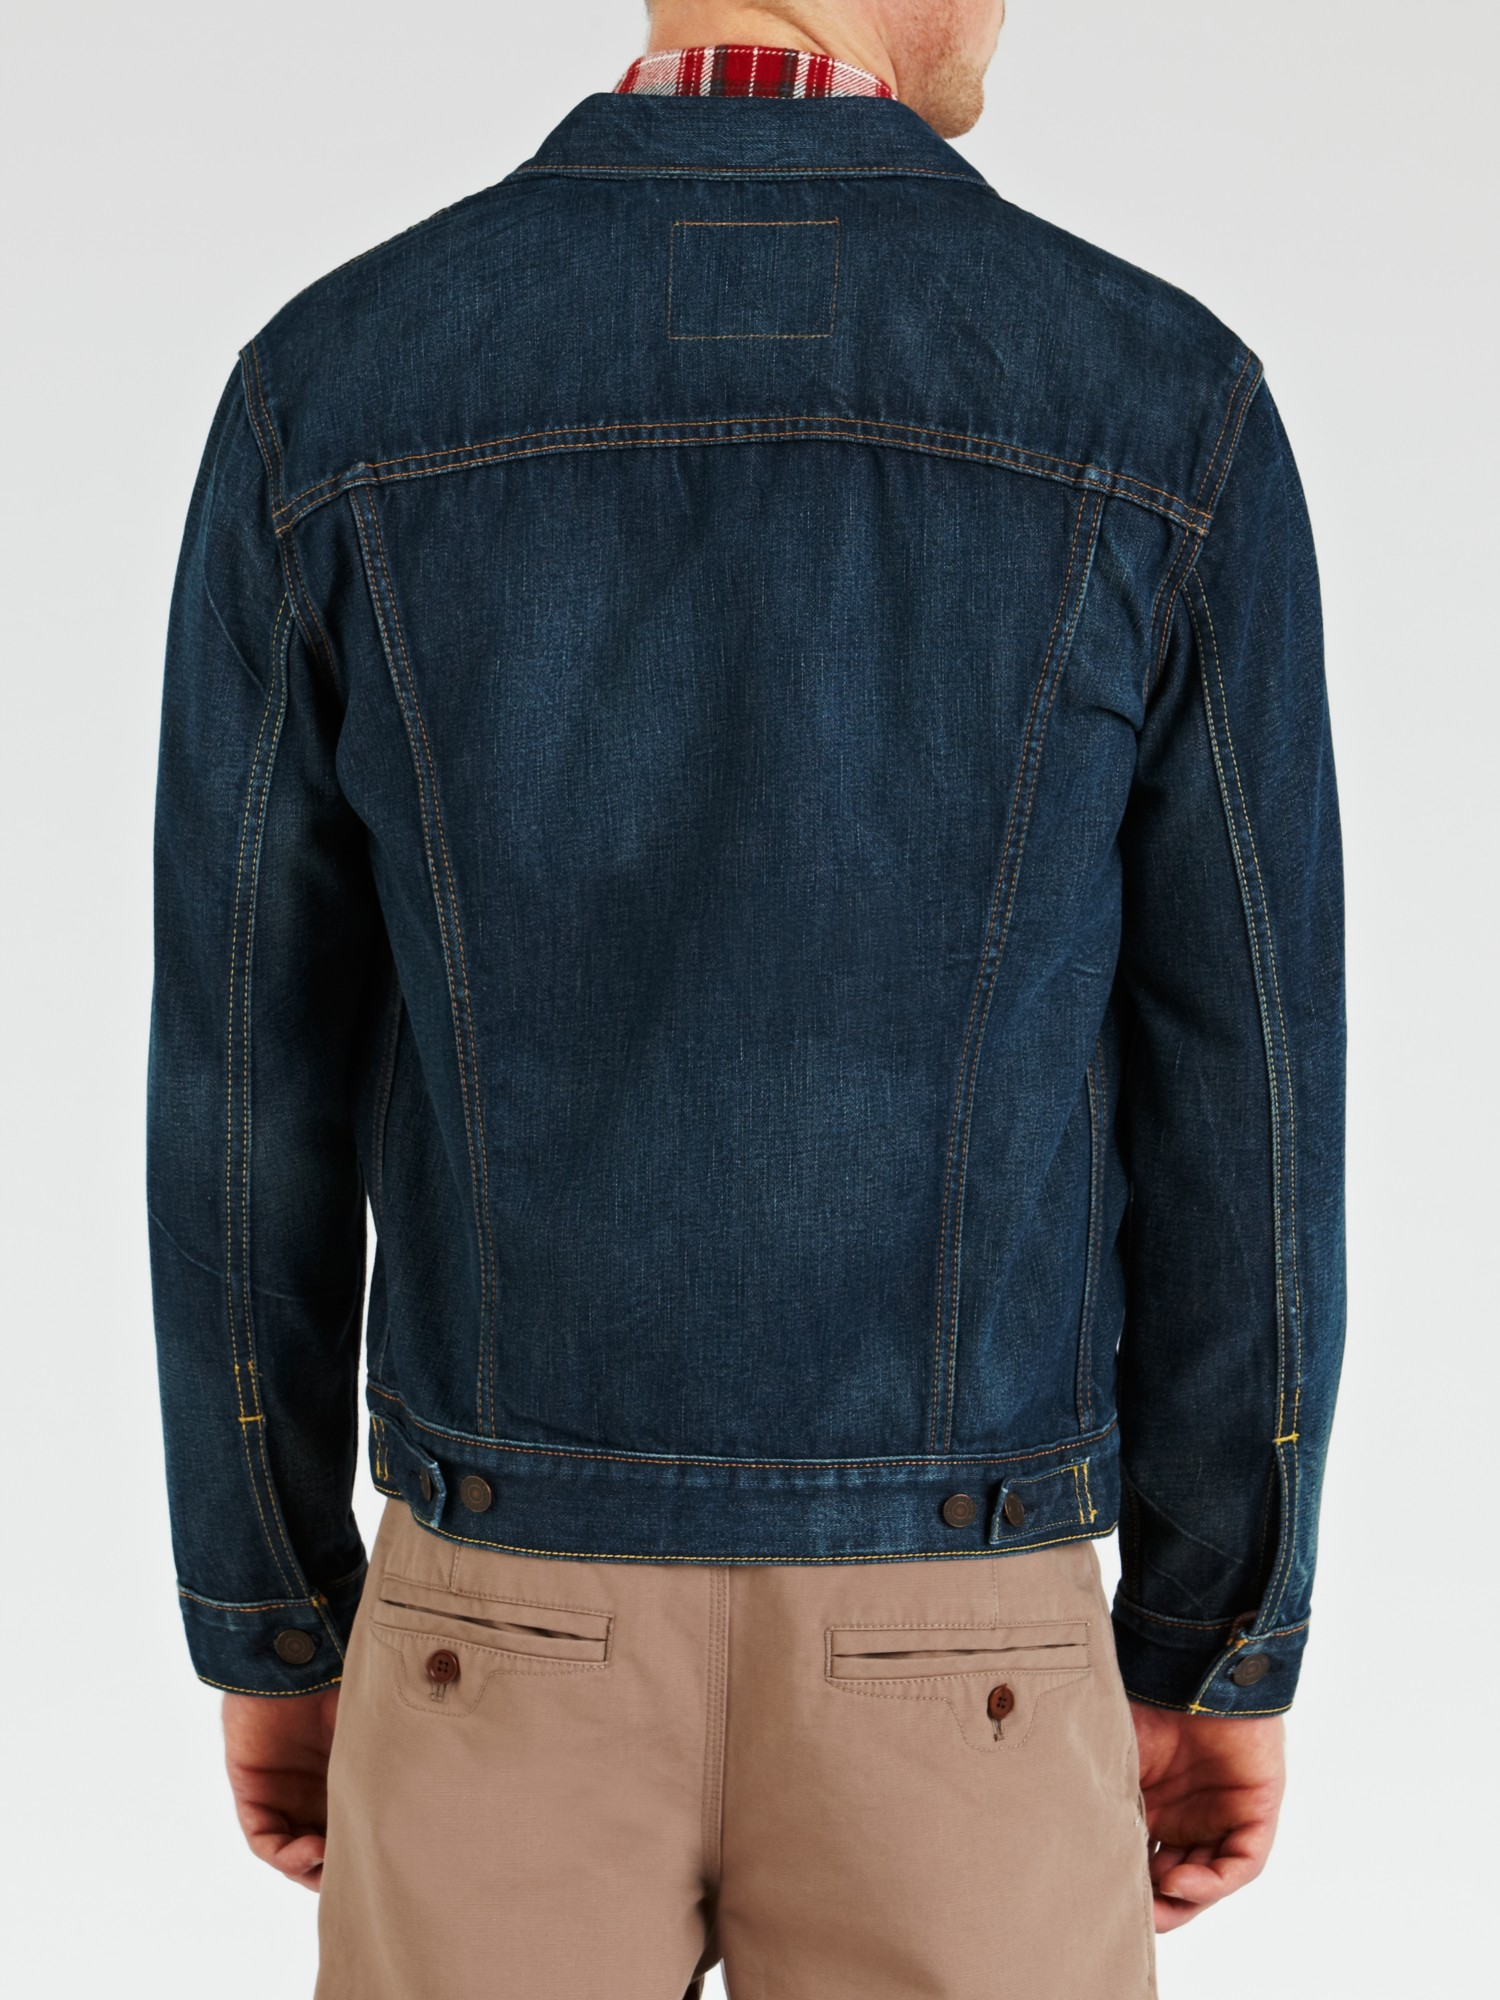 Levi's Levi's Rinse Denim Trucker Jacket in Blue for Men